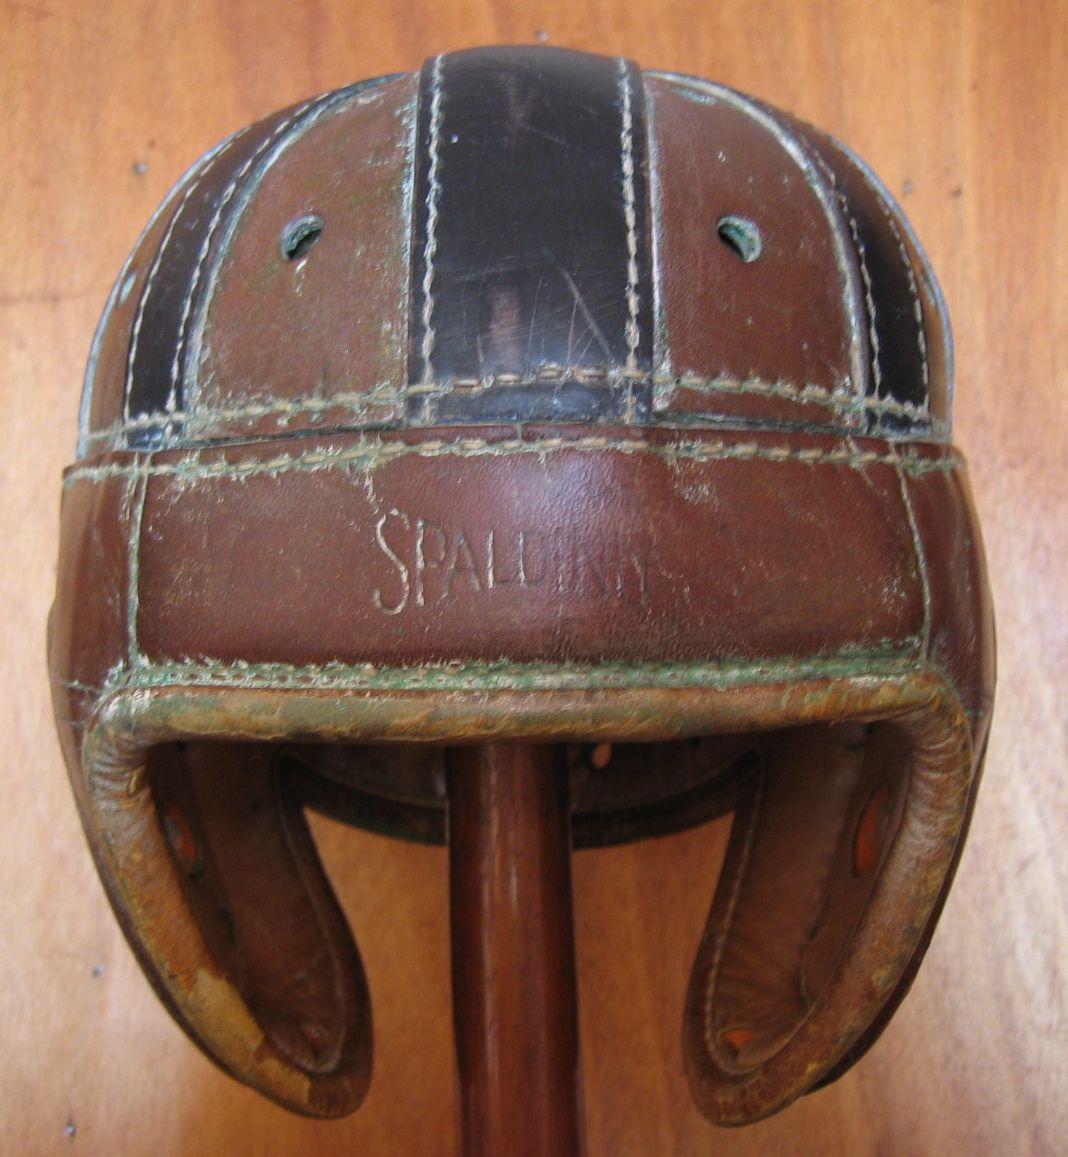 Casco de futbol americano A.G.Spalding & Bros (Estados Unidos) 1930 ...